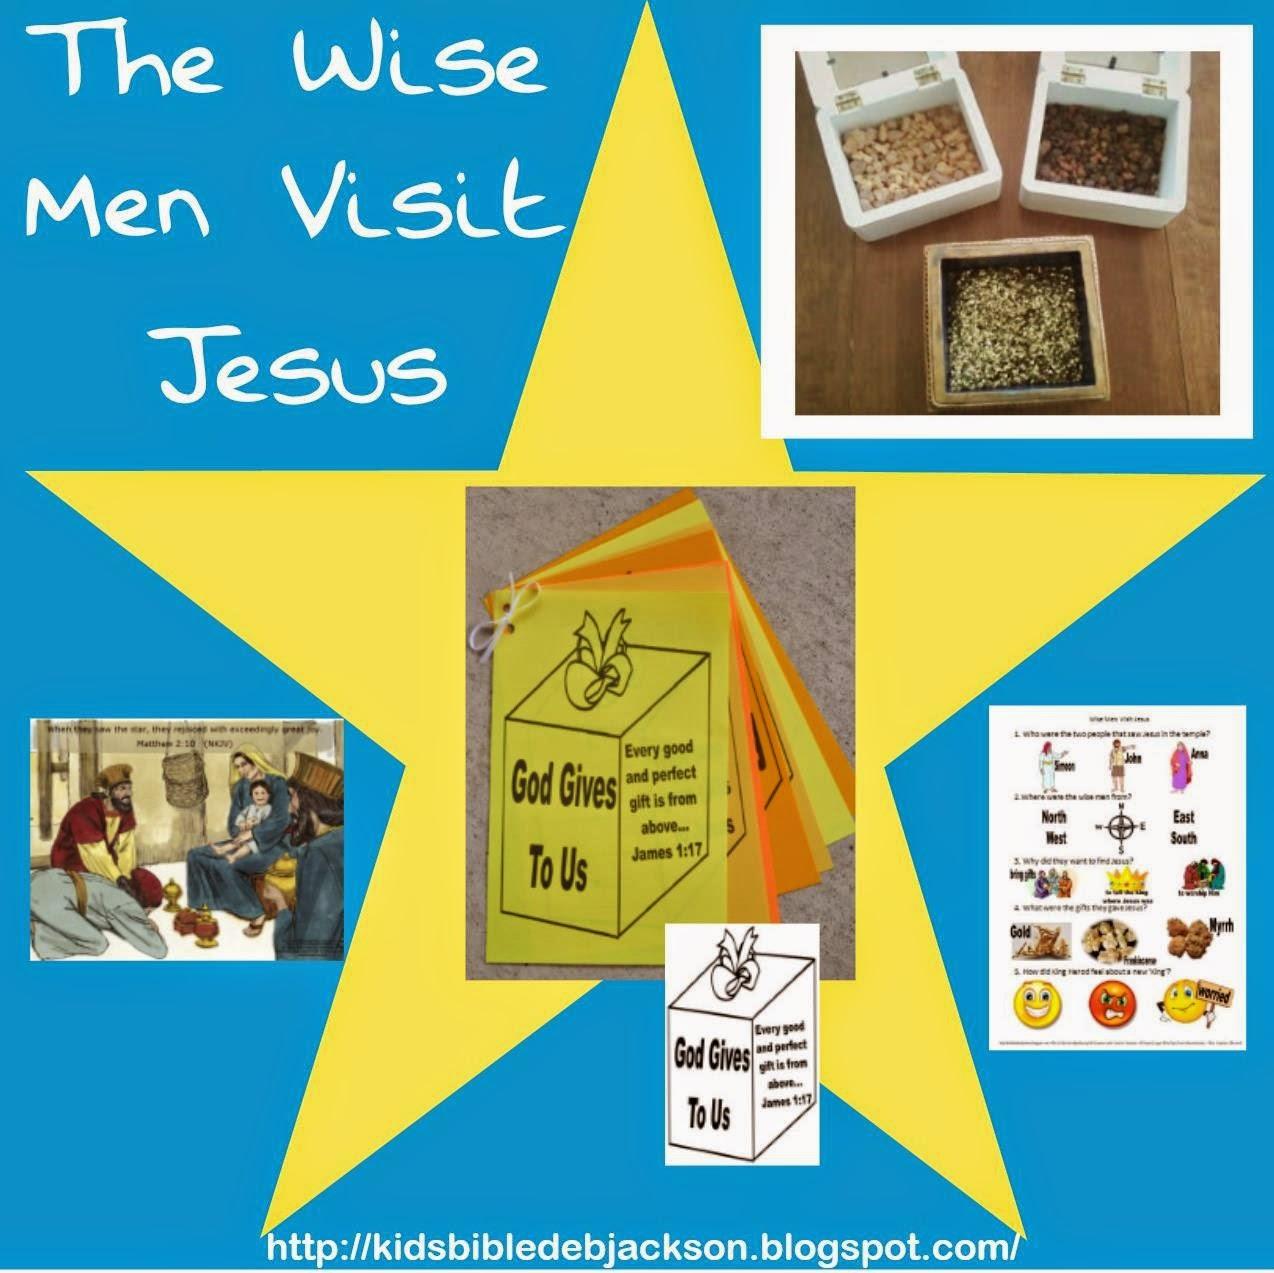 http://kidsbibledebjackson.blogspot.com/2014/06/the-wise-men-visit-jesus.html